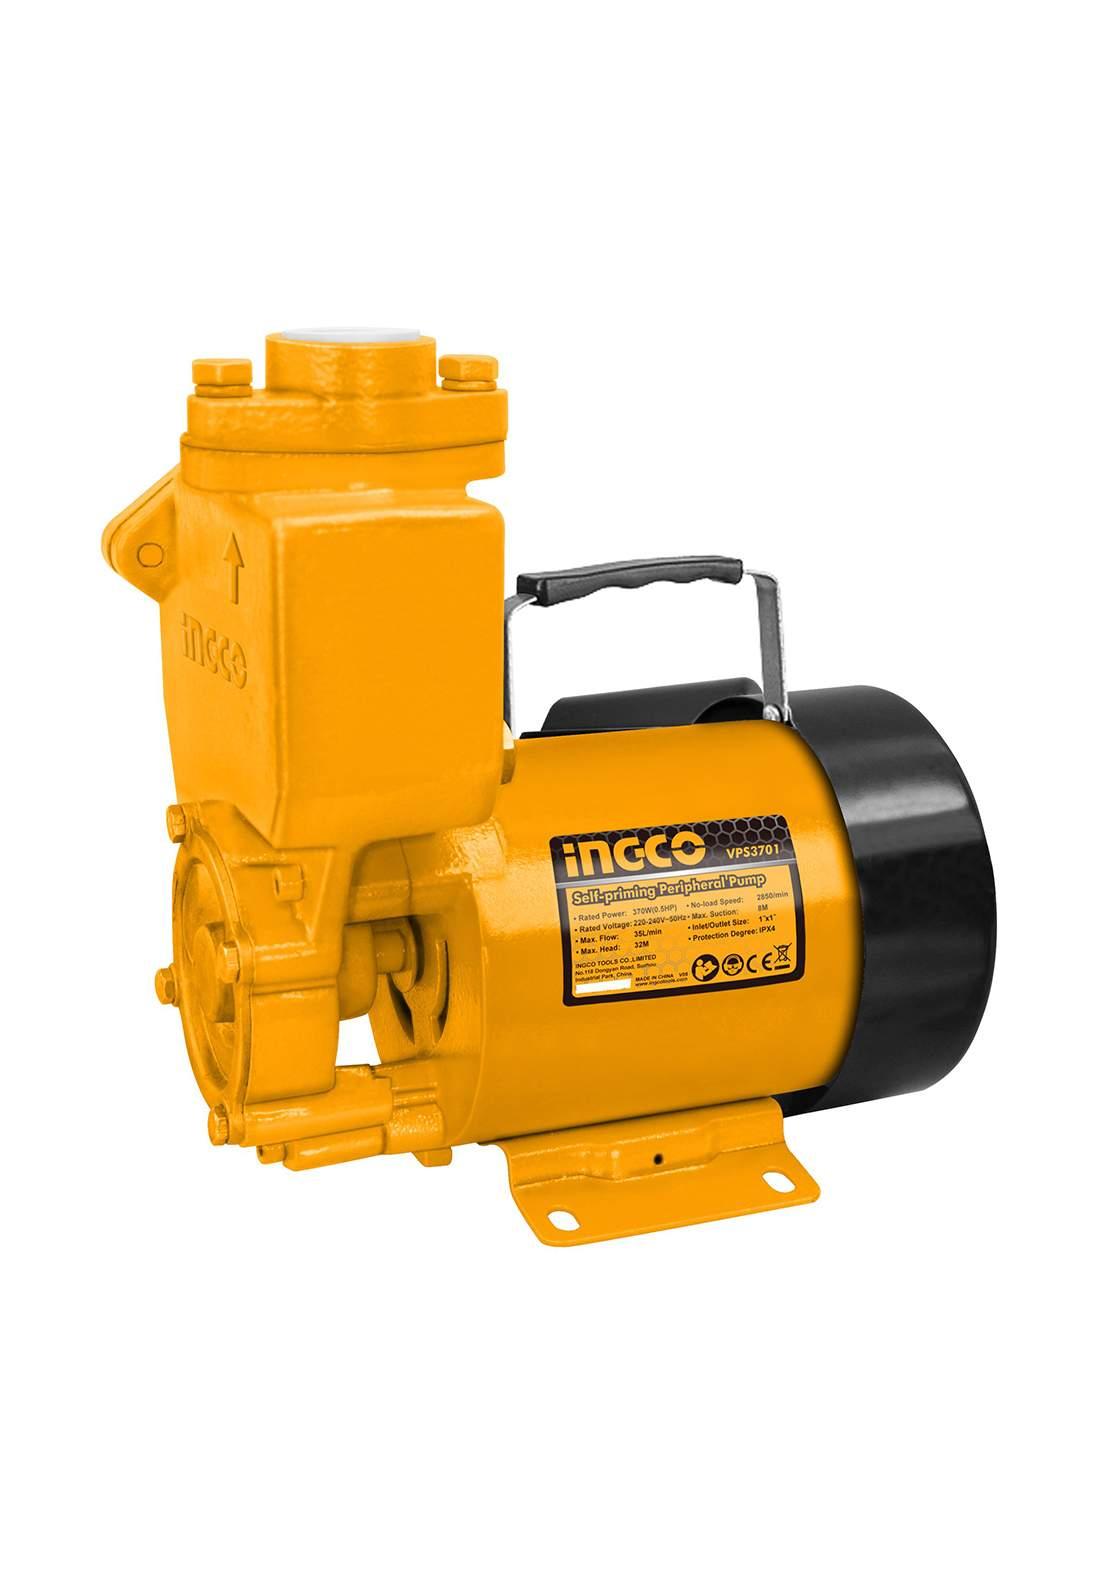 Ingco VPS3701 Self-Priming peripheral pump ماطور كهربائي 1/2 حصان